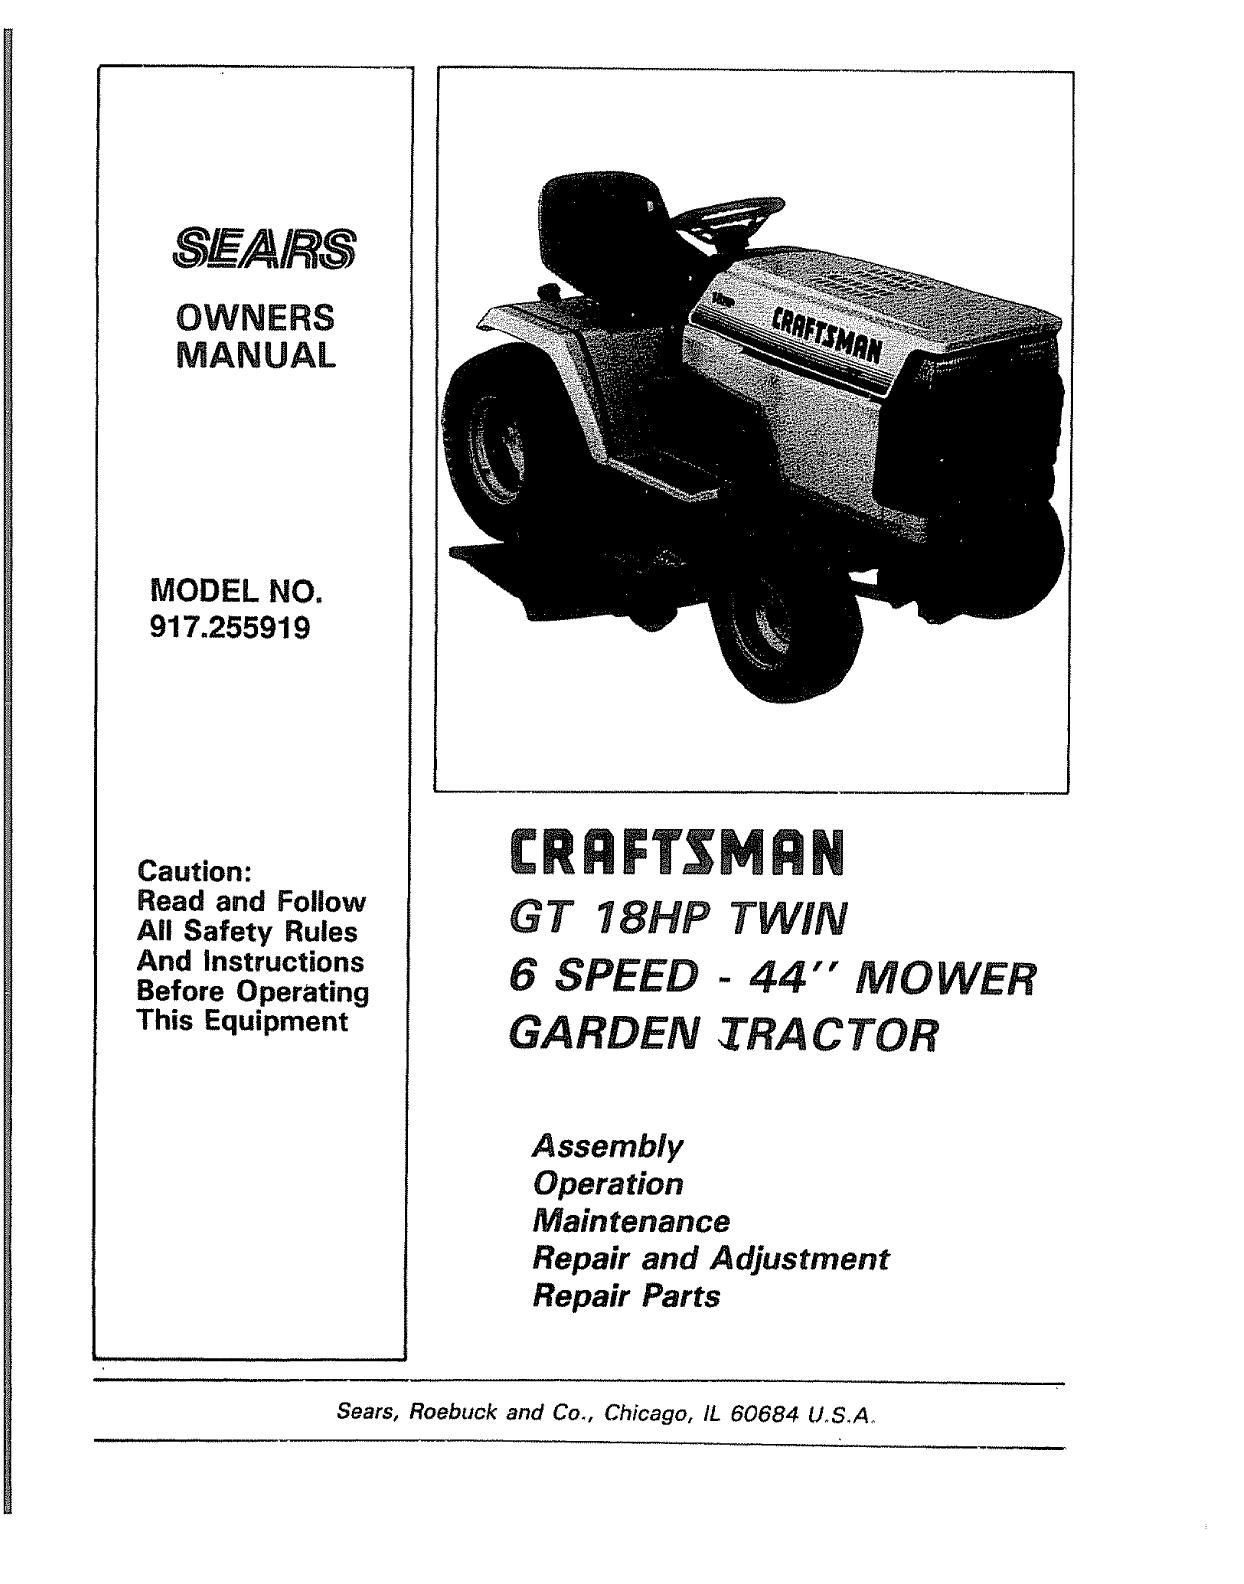 Craftsman 18 Hp Garden Tractor Manual - Garden and Modern